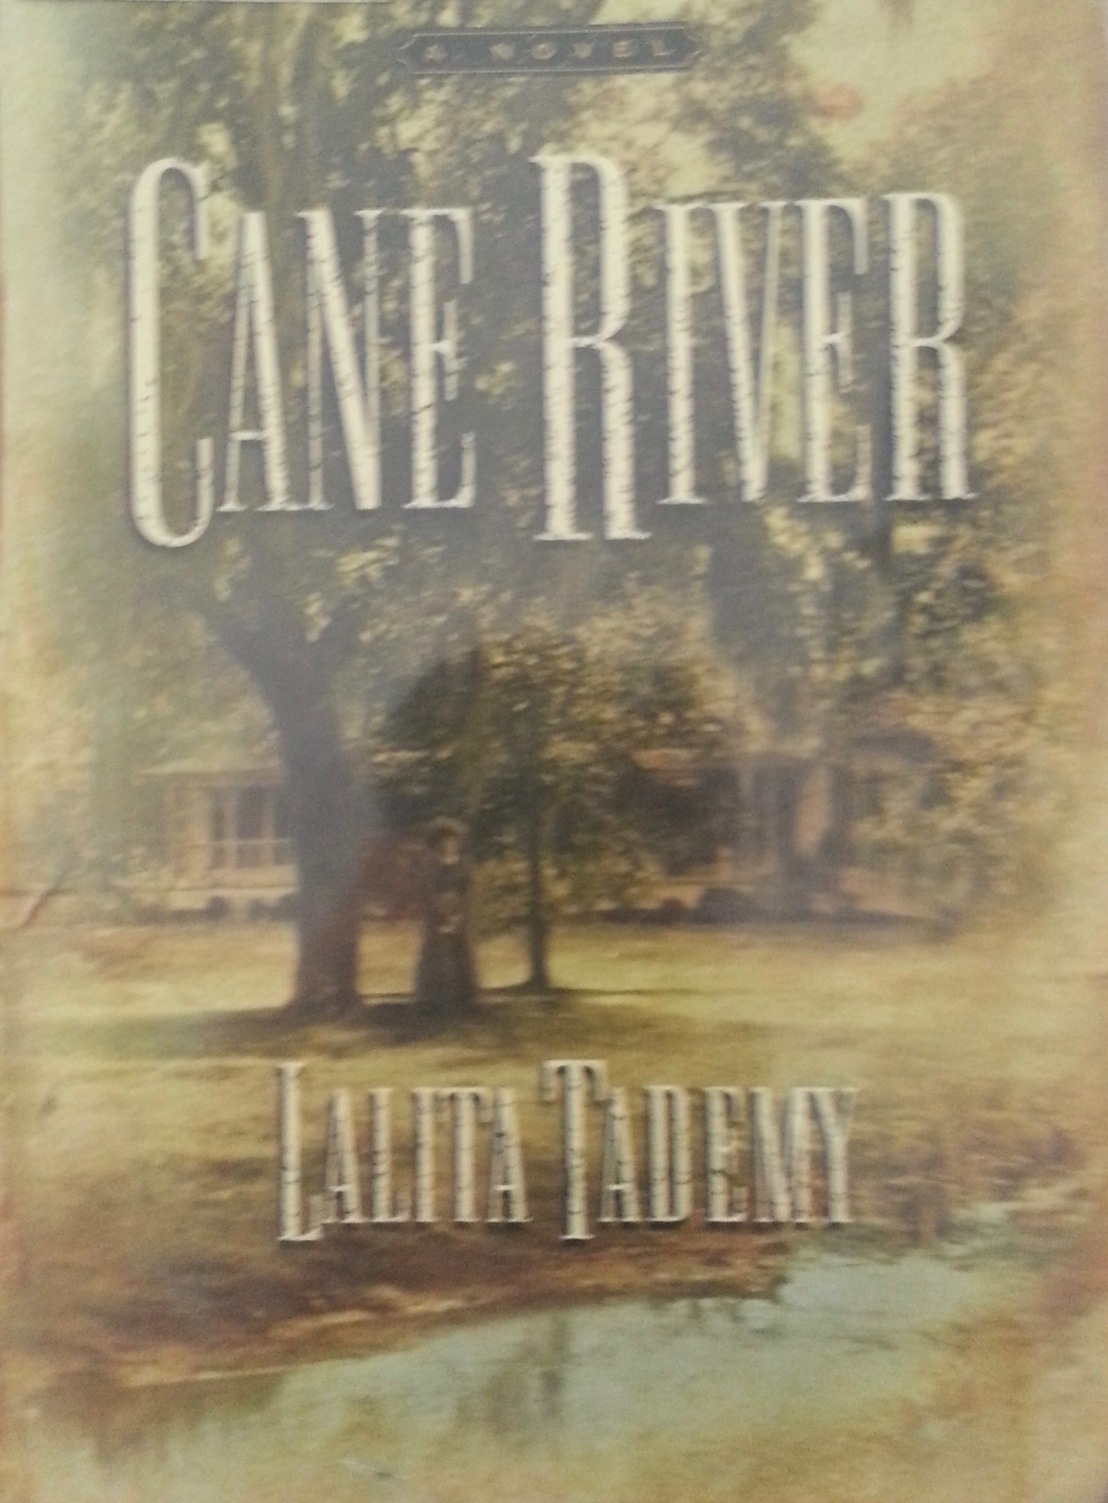 Latita Tademy's — Cane River*****